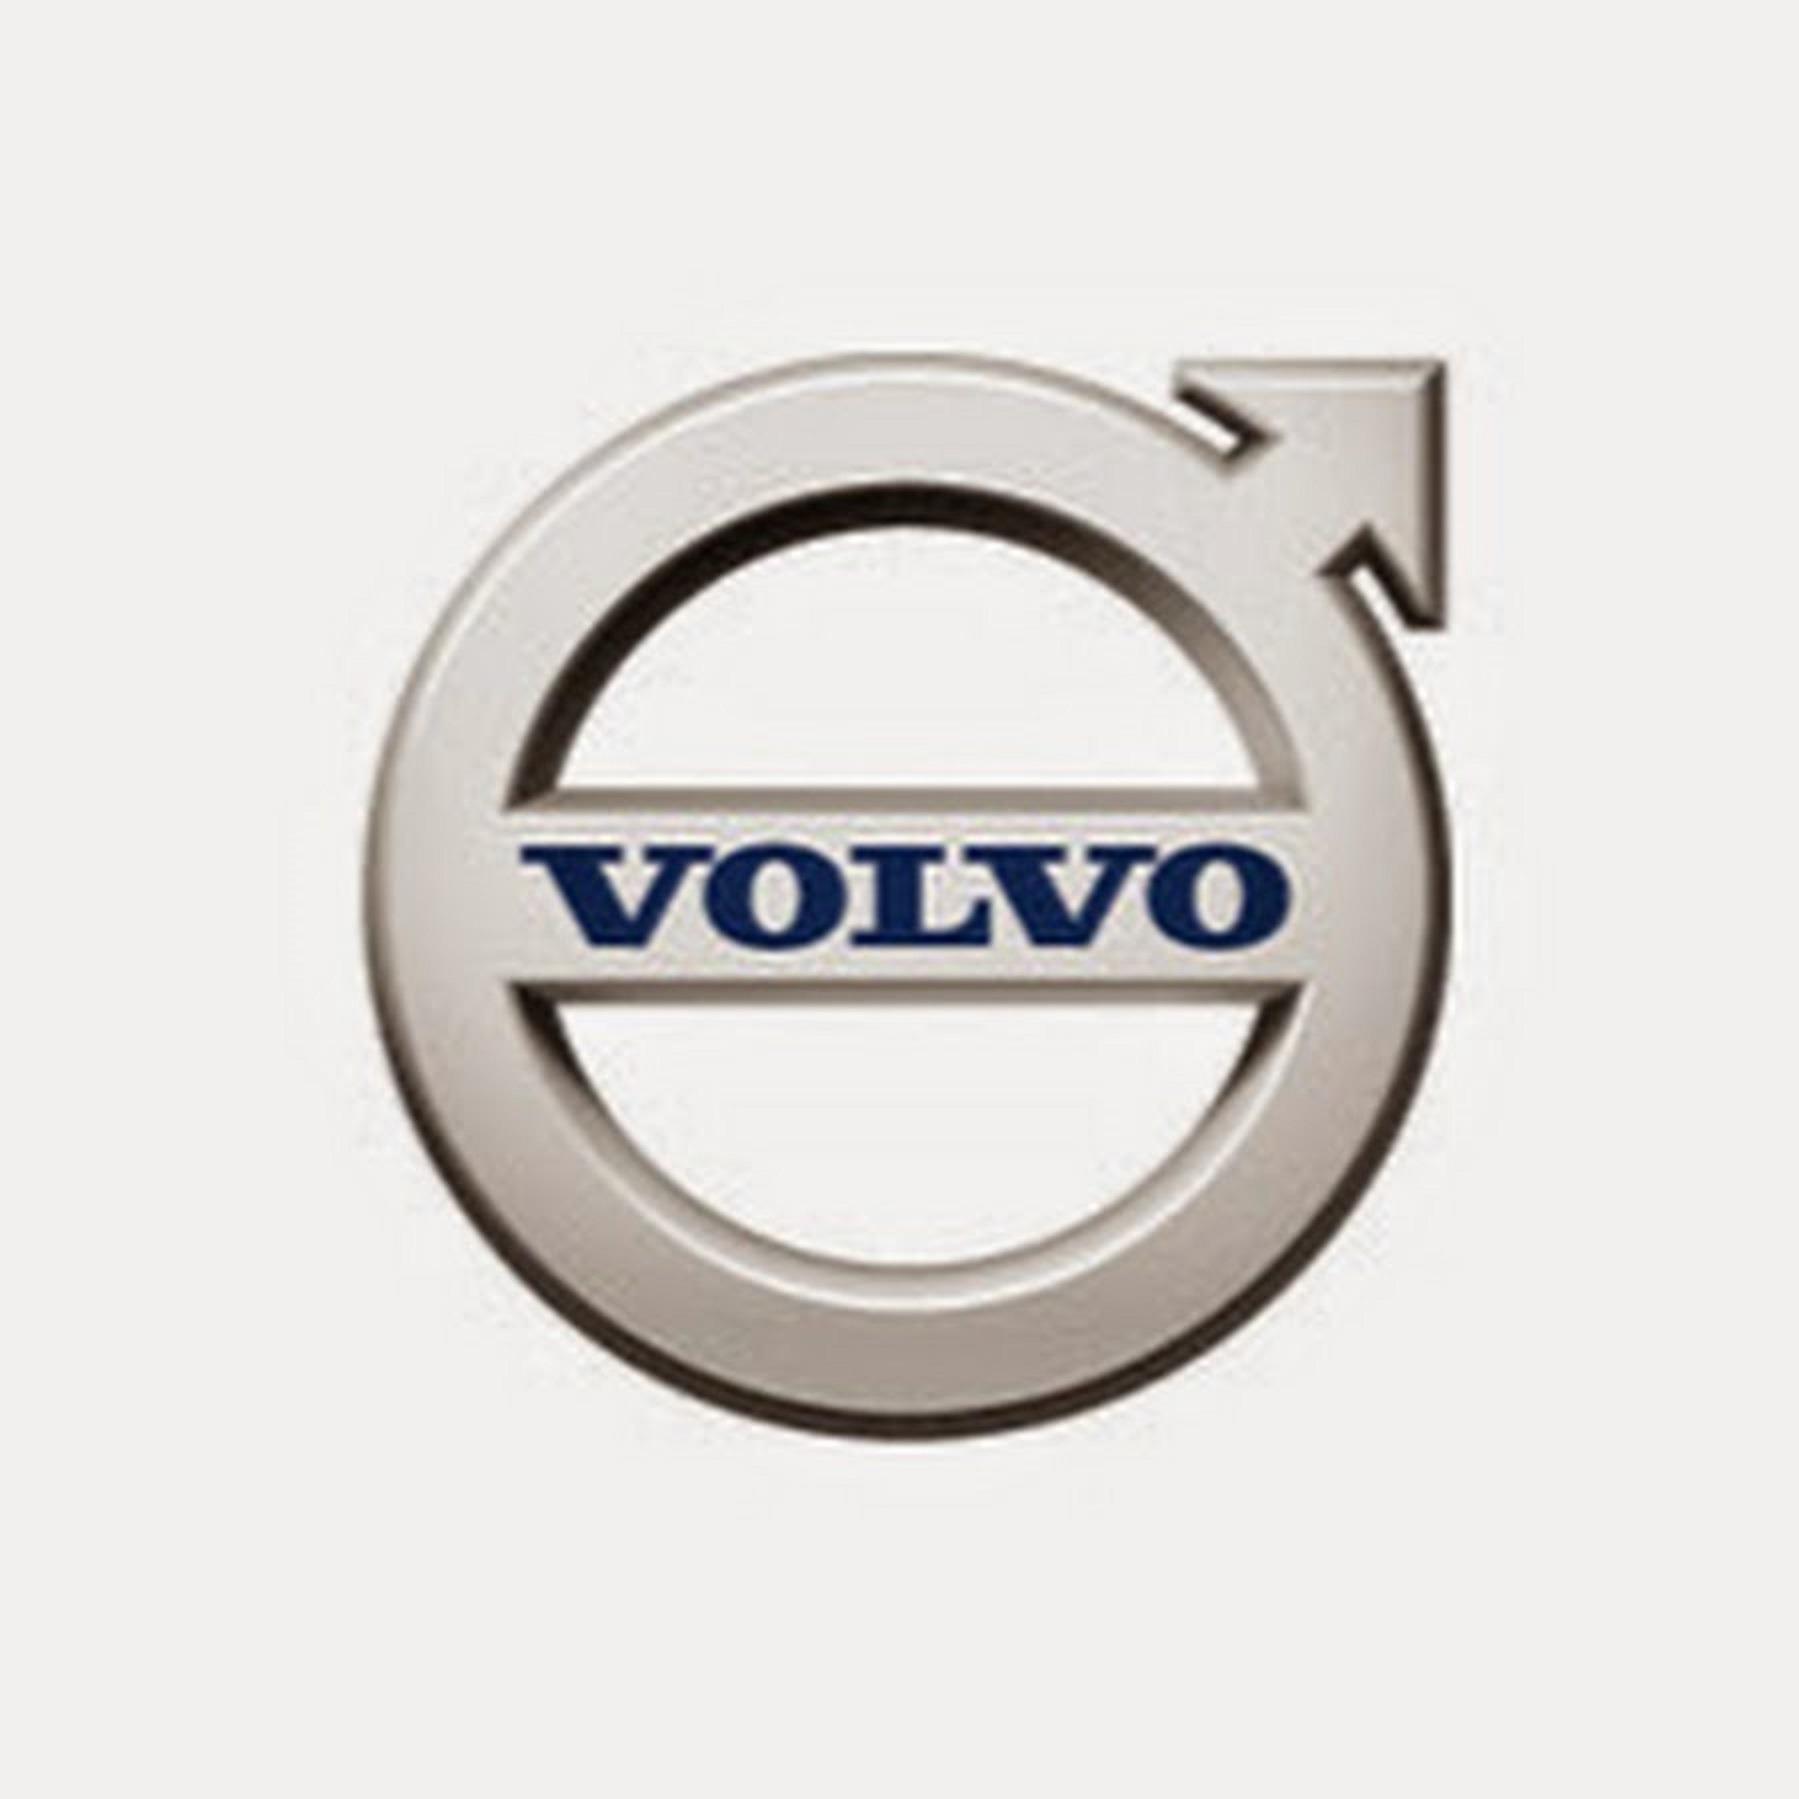 Volvo North America logo